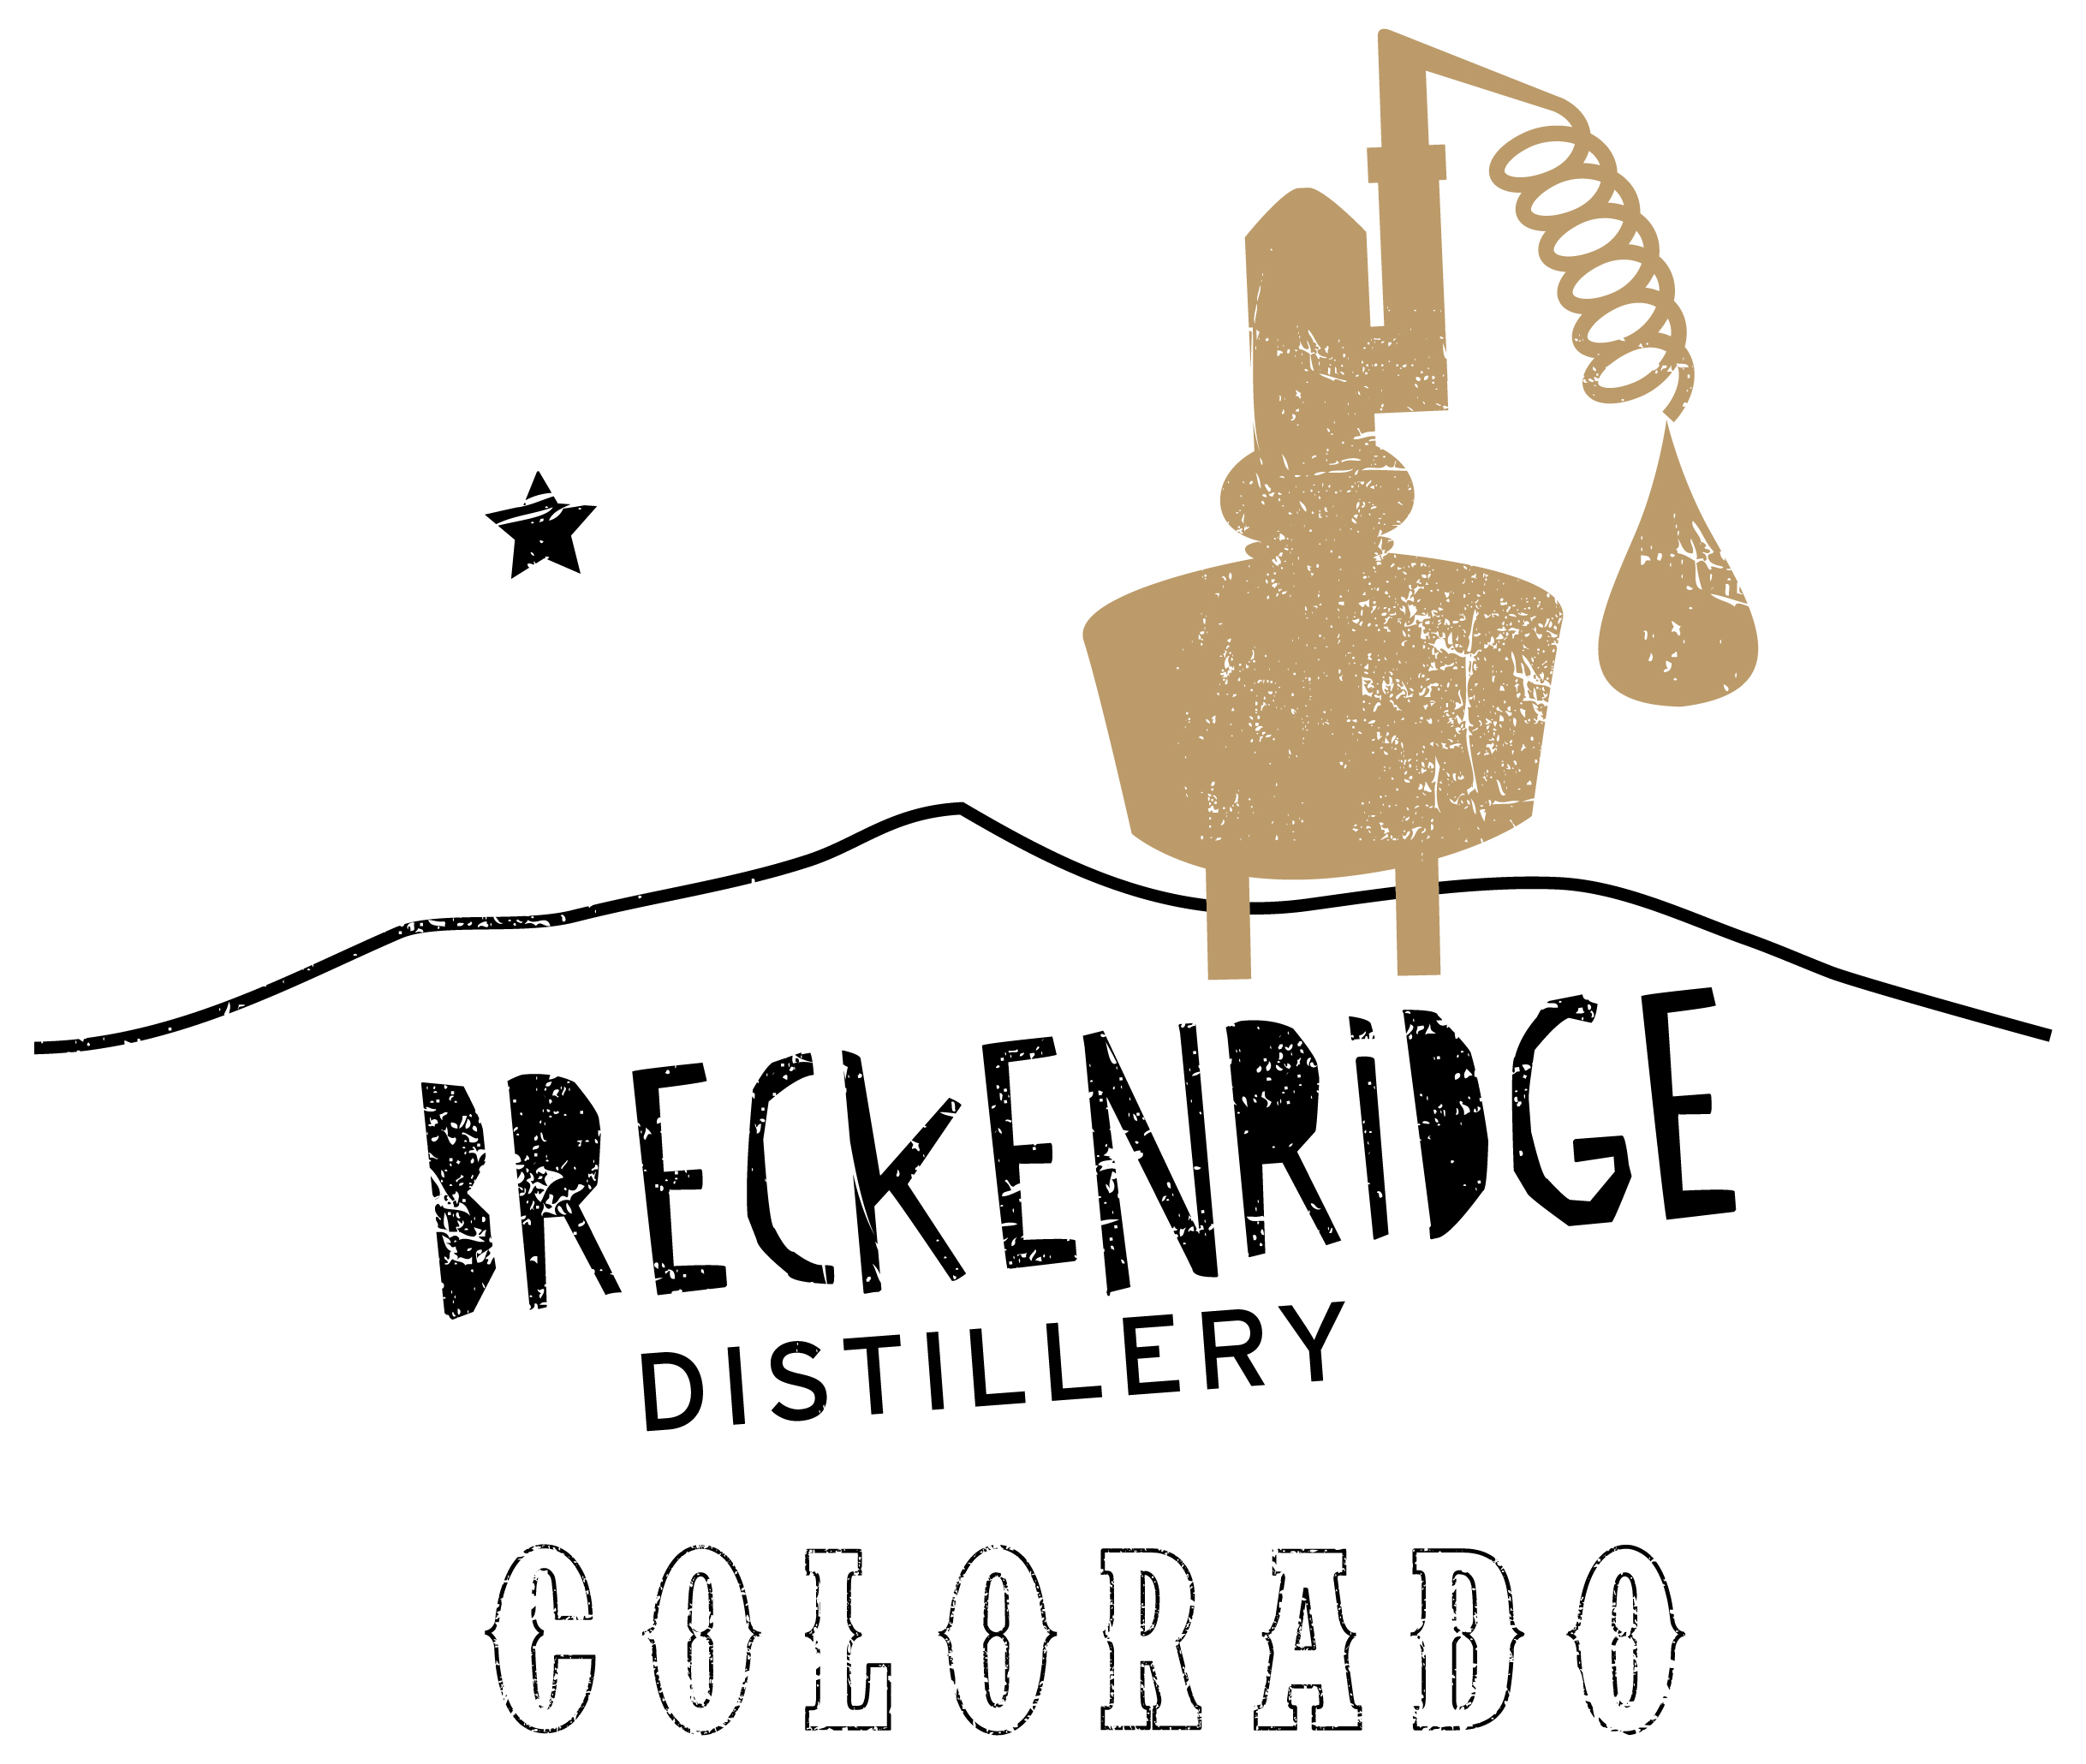 Breckenridge Distillery Logo